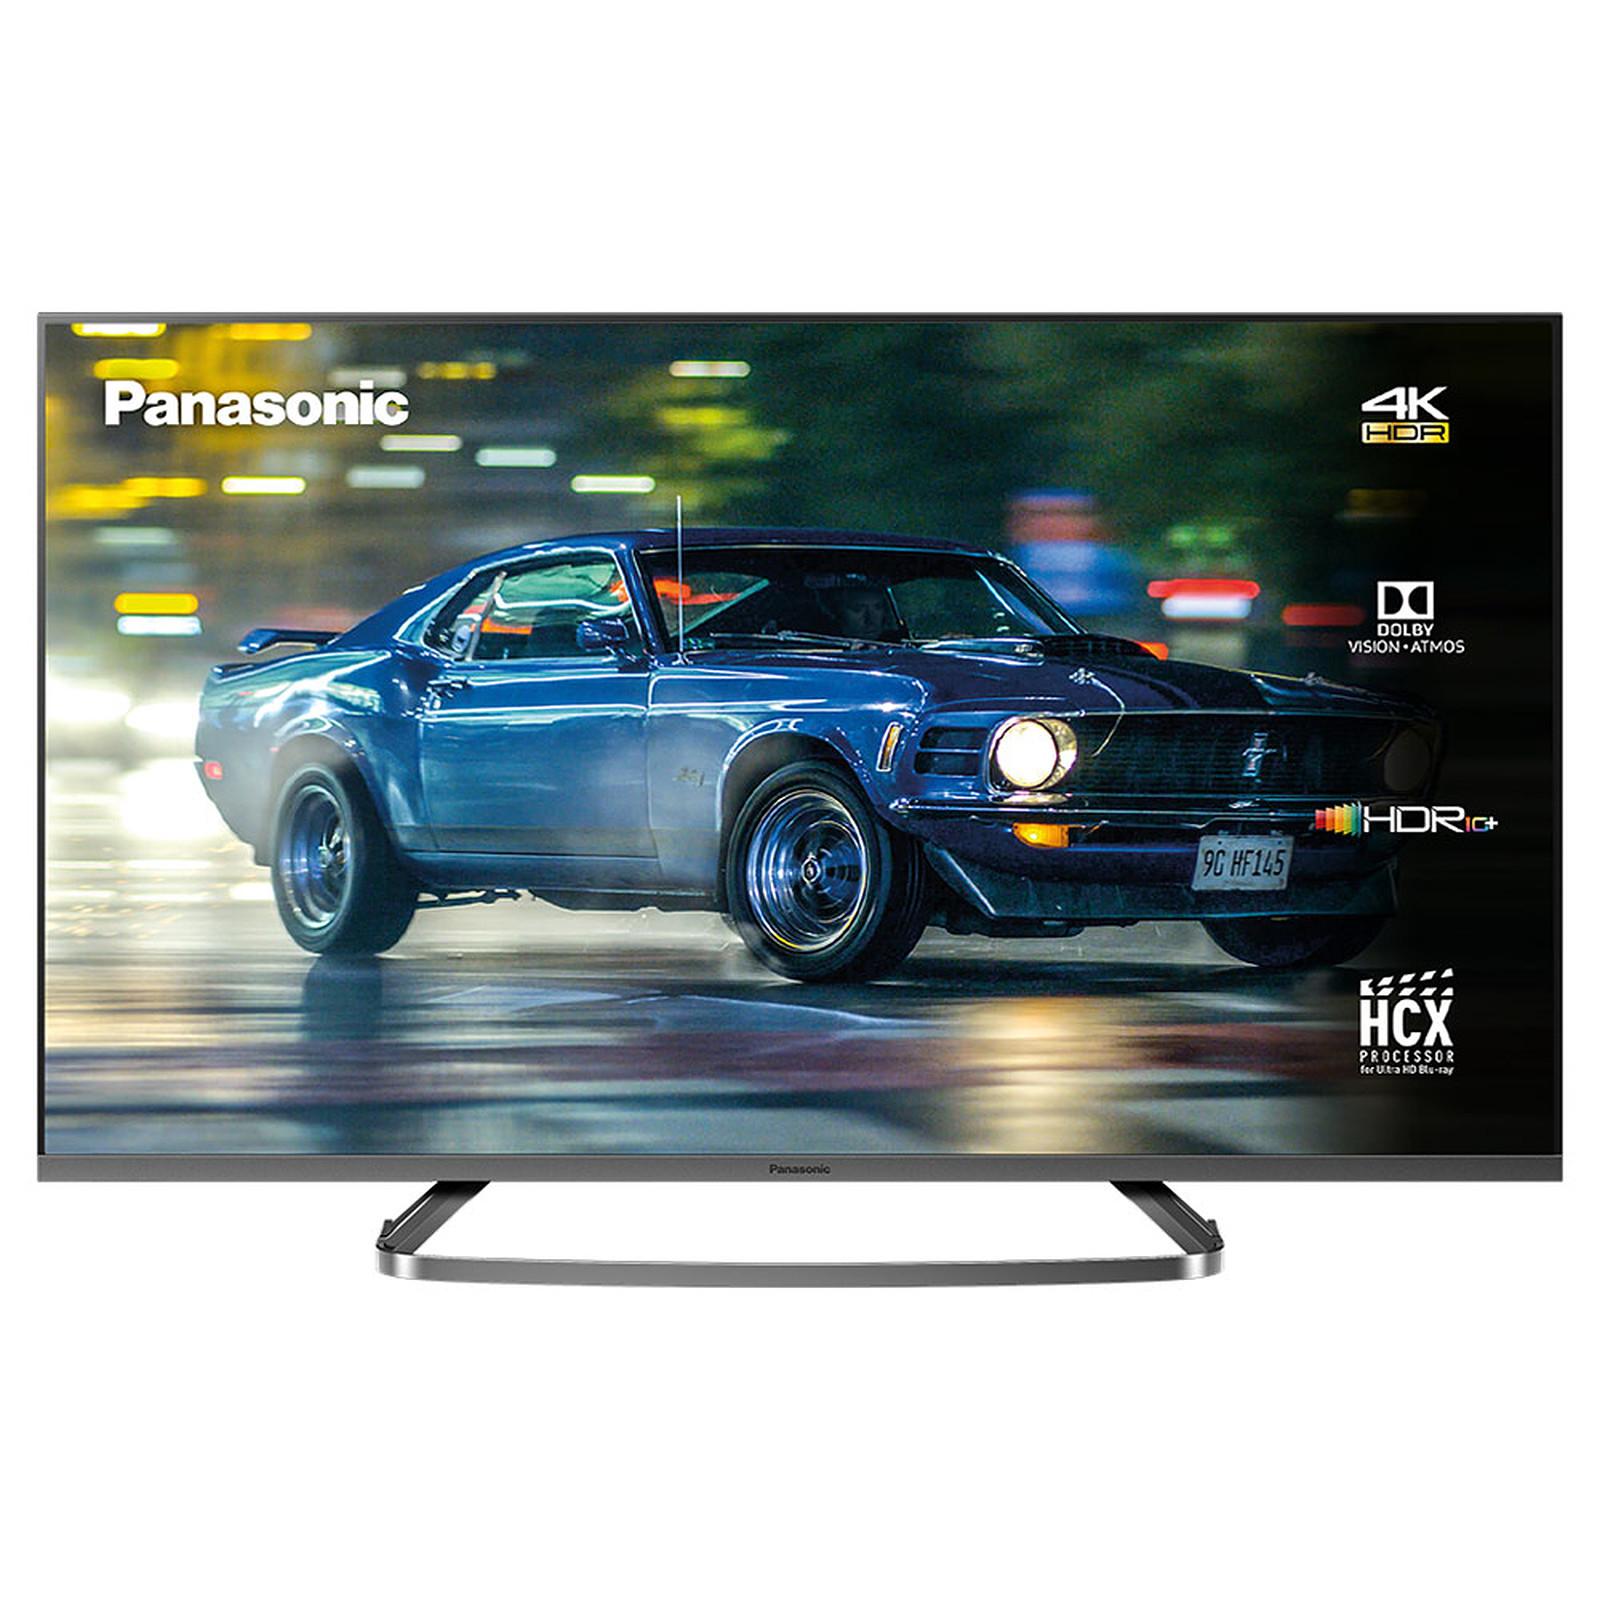 "TV 58"" Panasonic TX-58GX830E - LED, 4K UHD, HDR 10+, Dolby Vision & Atmos, 1800 Hz BMR, Smart TV (Compatible Alexa et Google Assistant)"